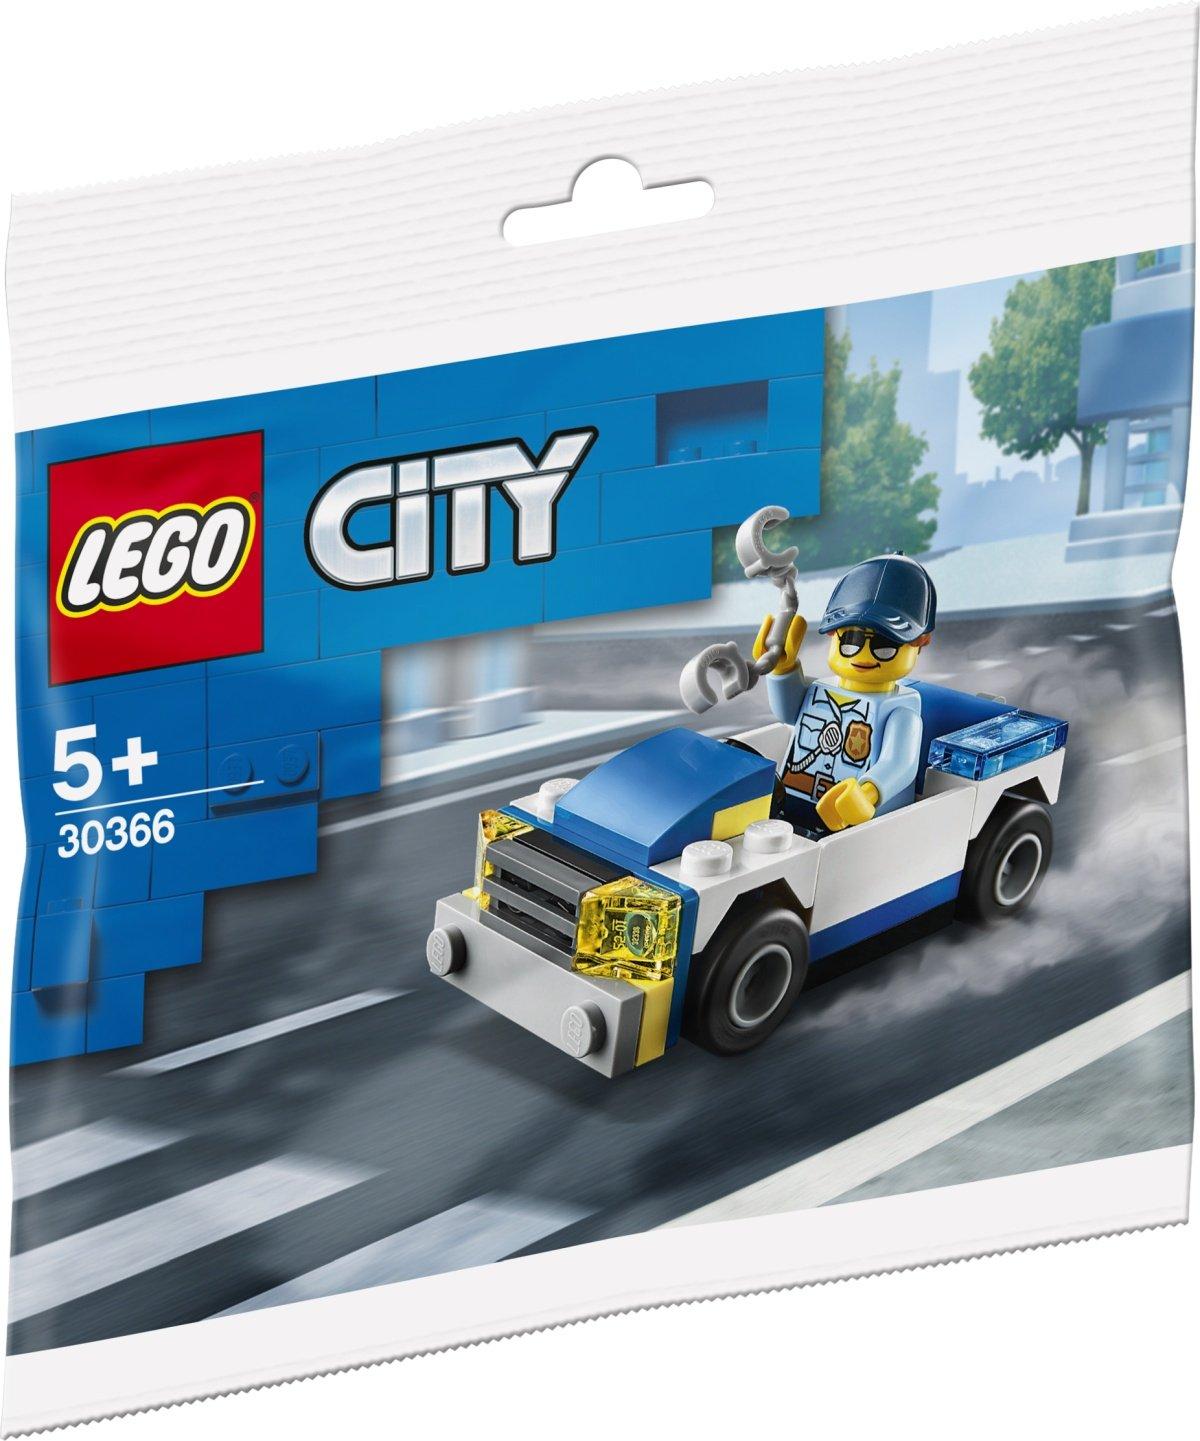 lego-polybag-city-30366-0001